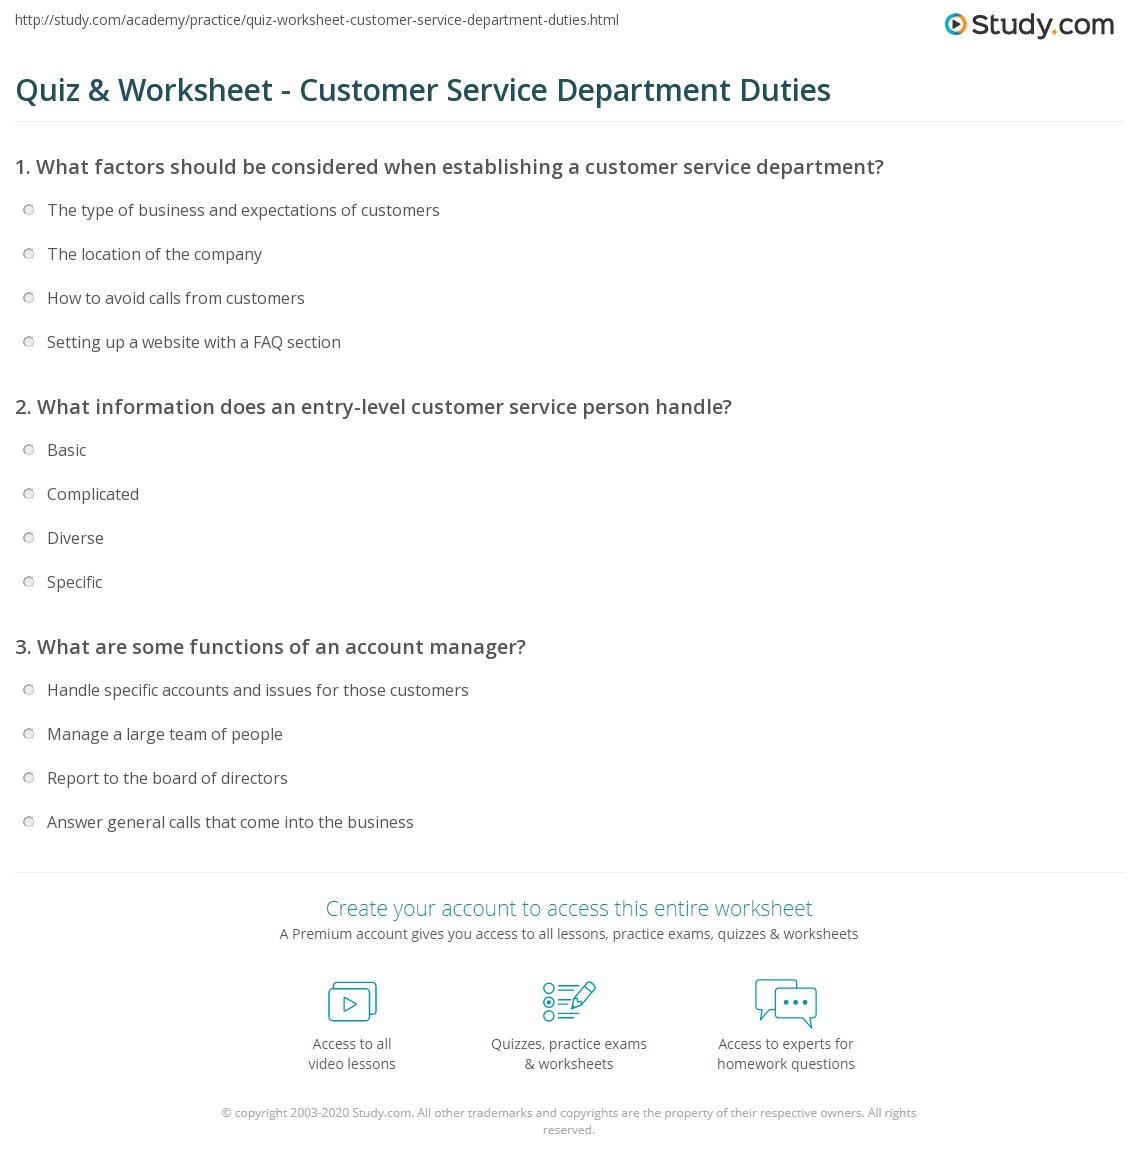 Quiz & Worksheet - Customer Service Department Duties | Study.com